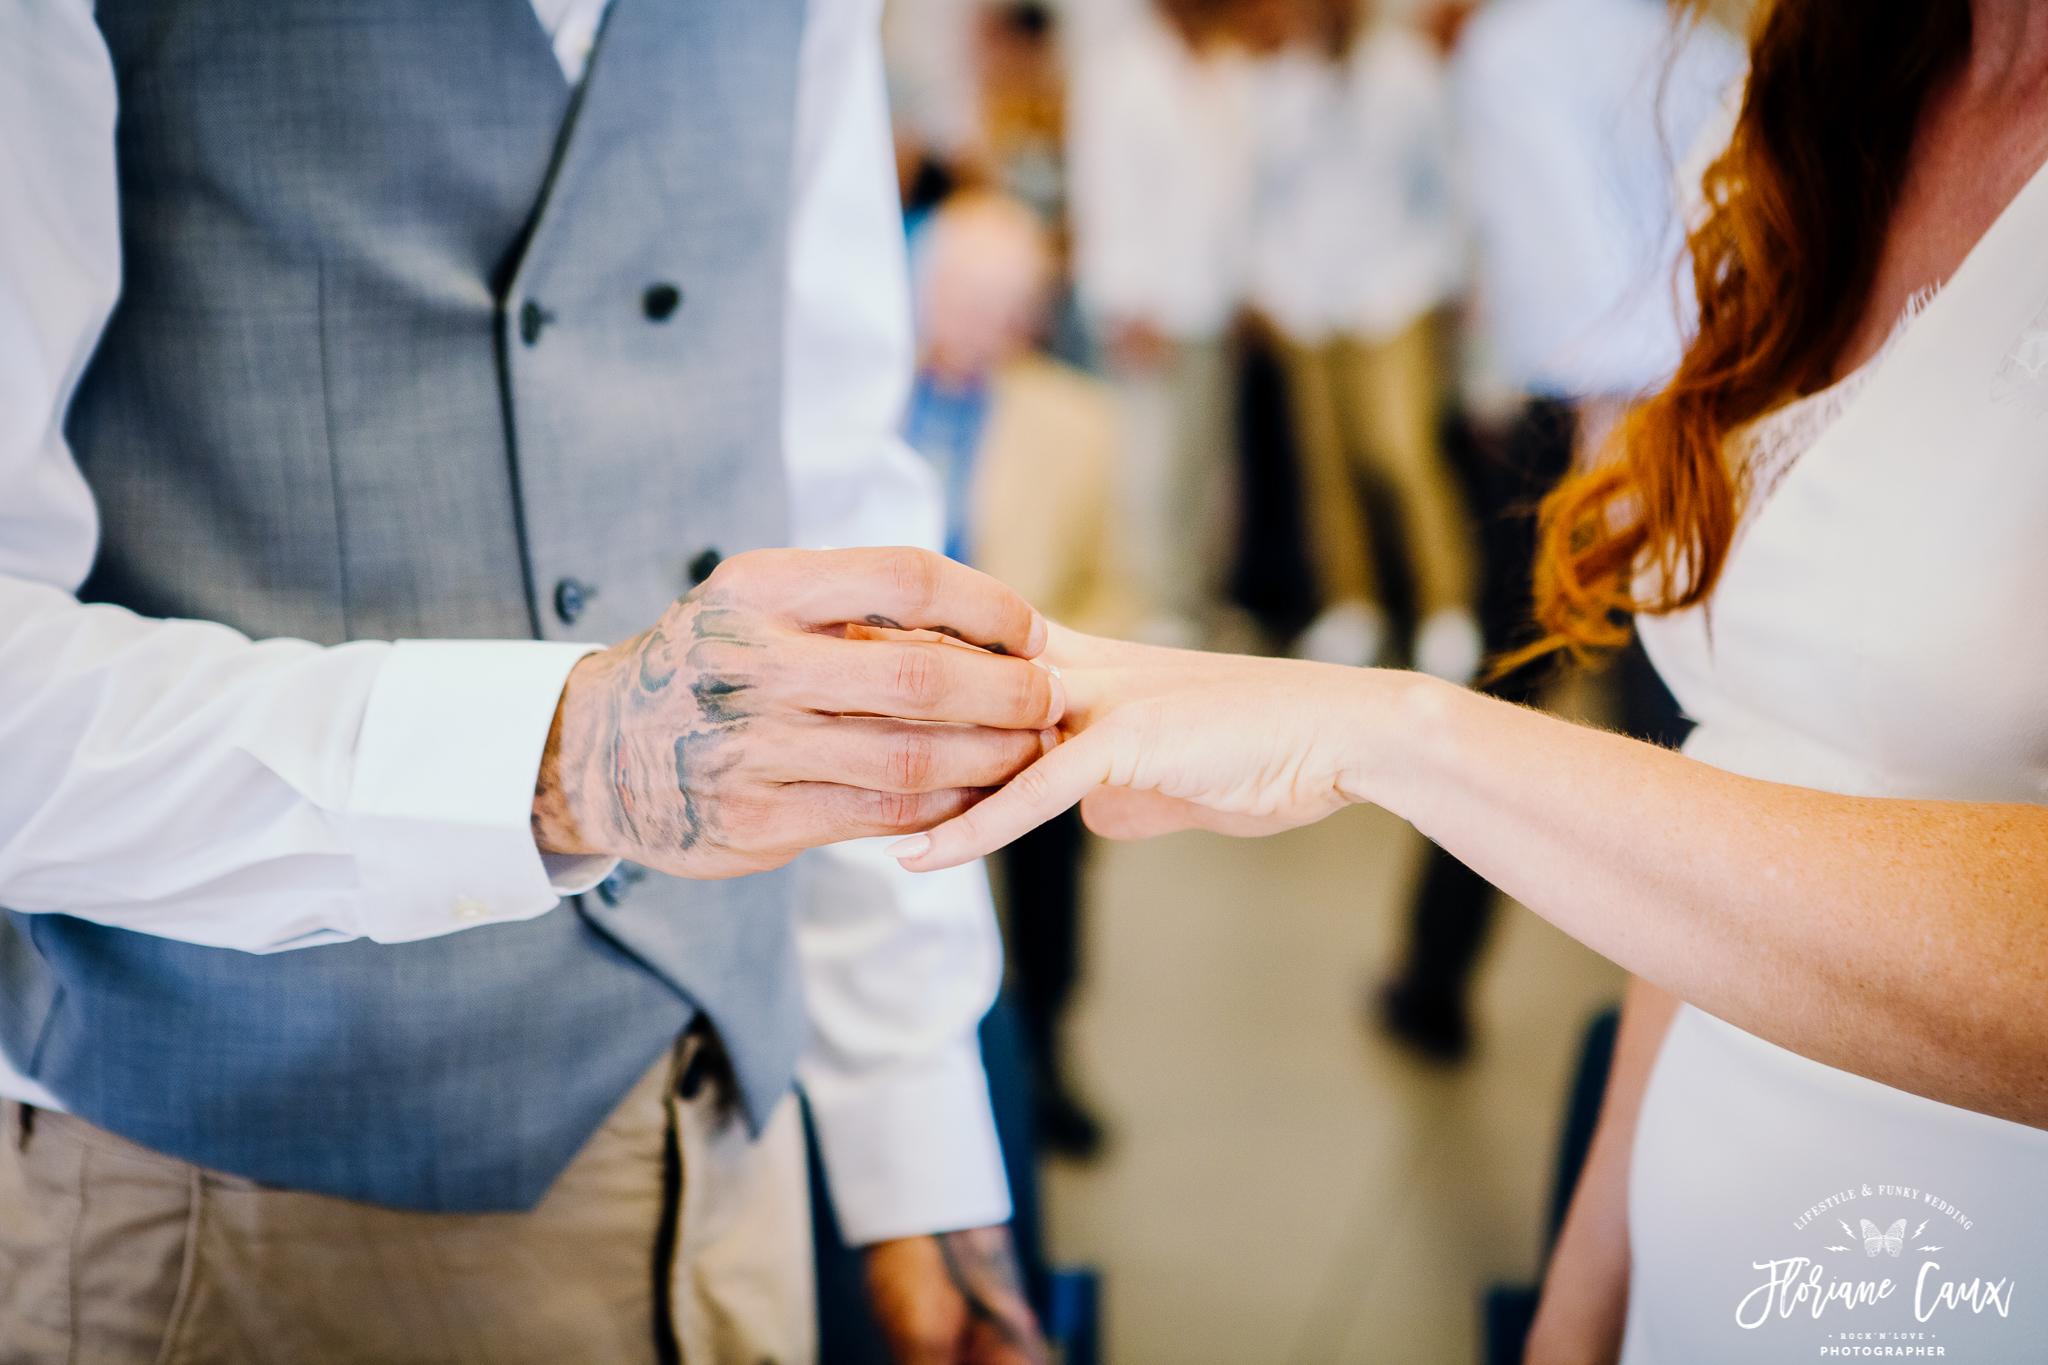 photographe-mariage-toulouse-rocknroll-maries-tatoues-floriane-caux-37